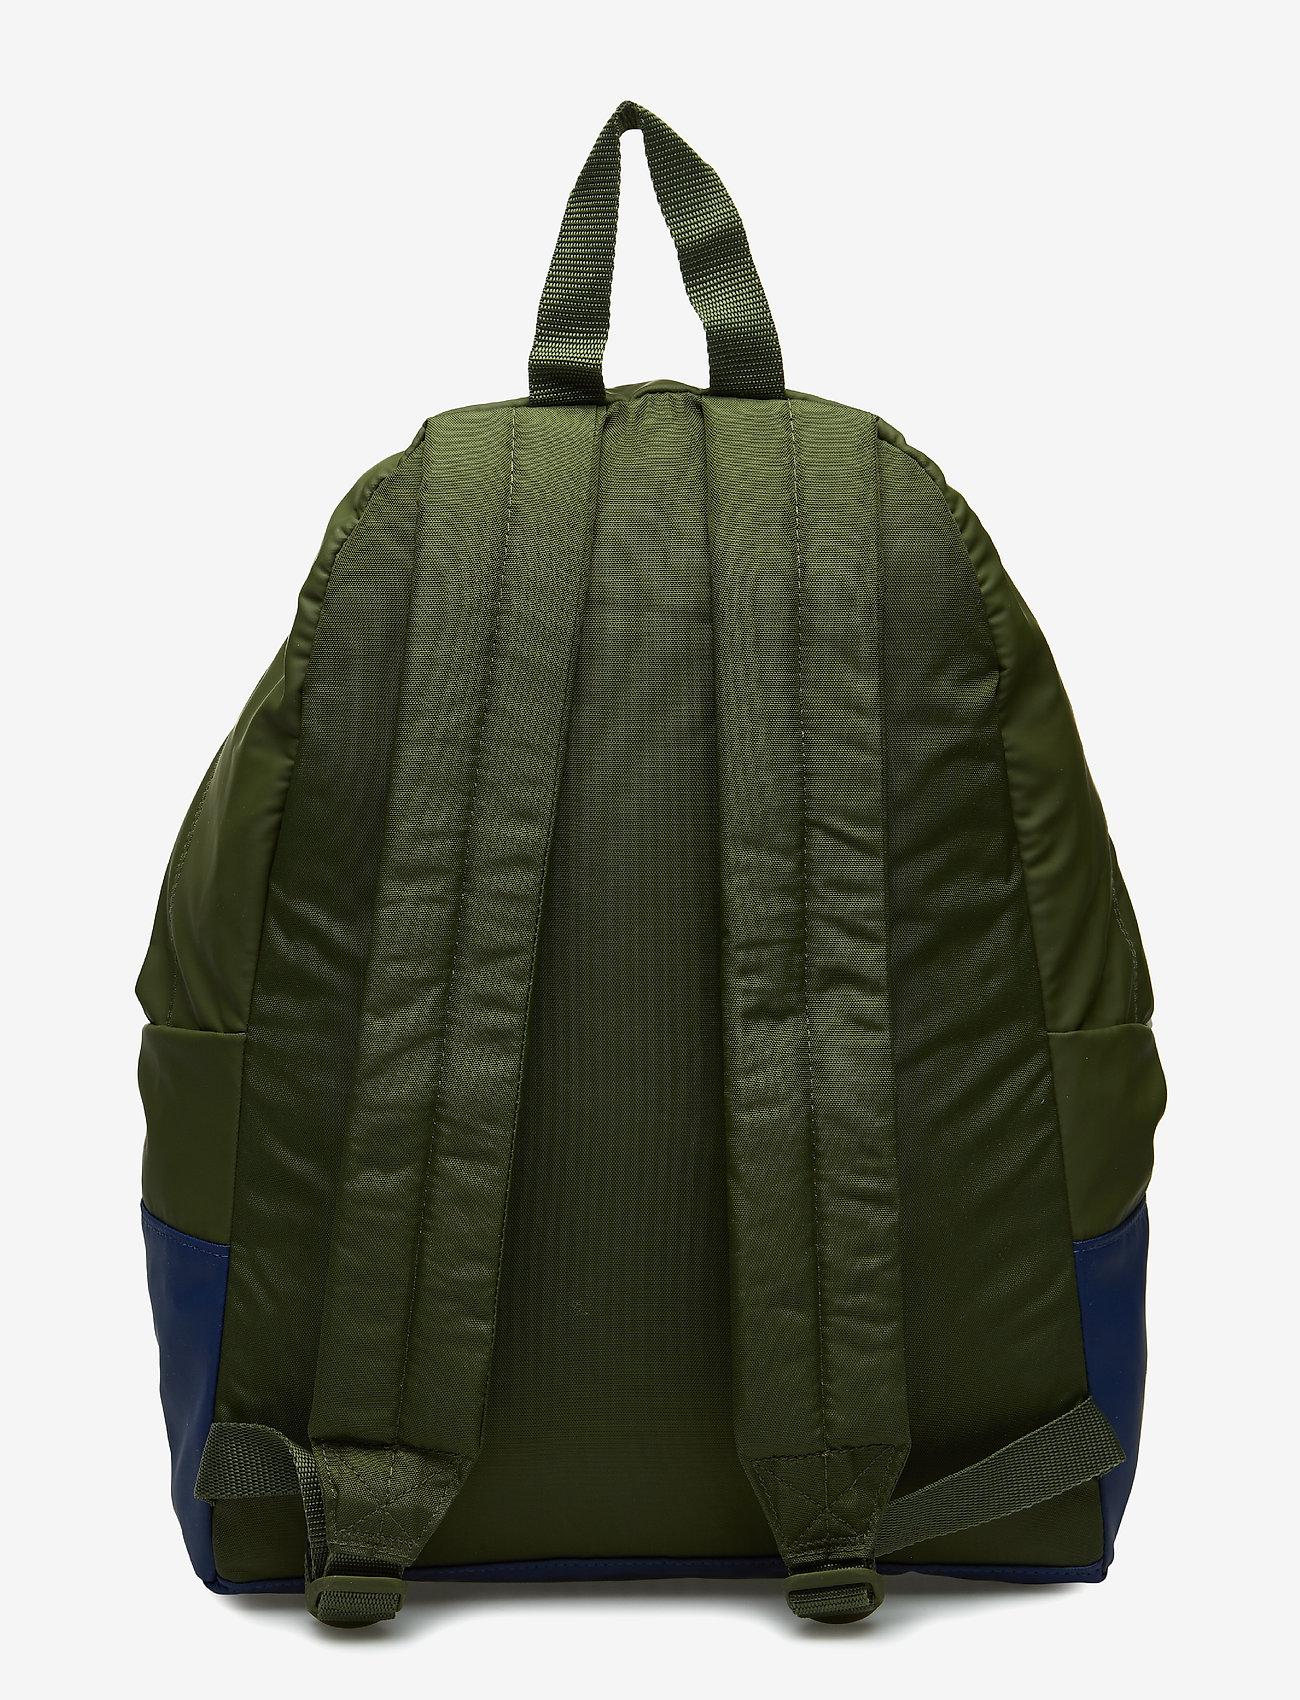 Eastpak - PADDED PAK'R - rucksäcke - brimblock khaki - 1